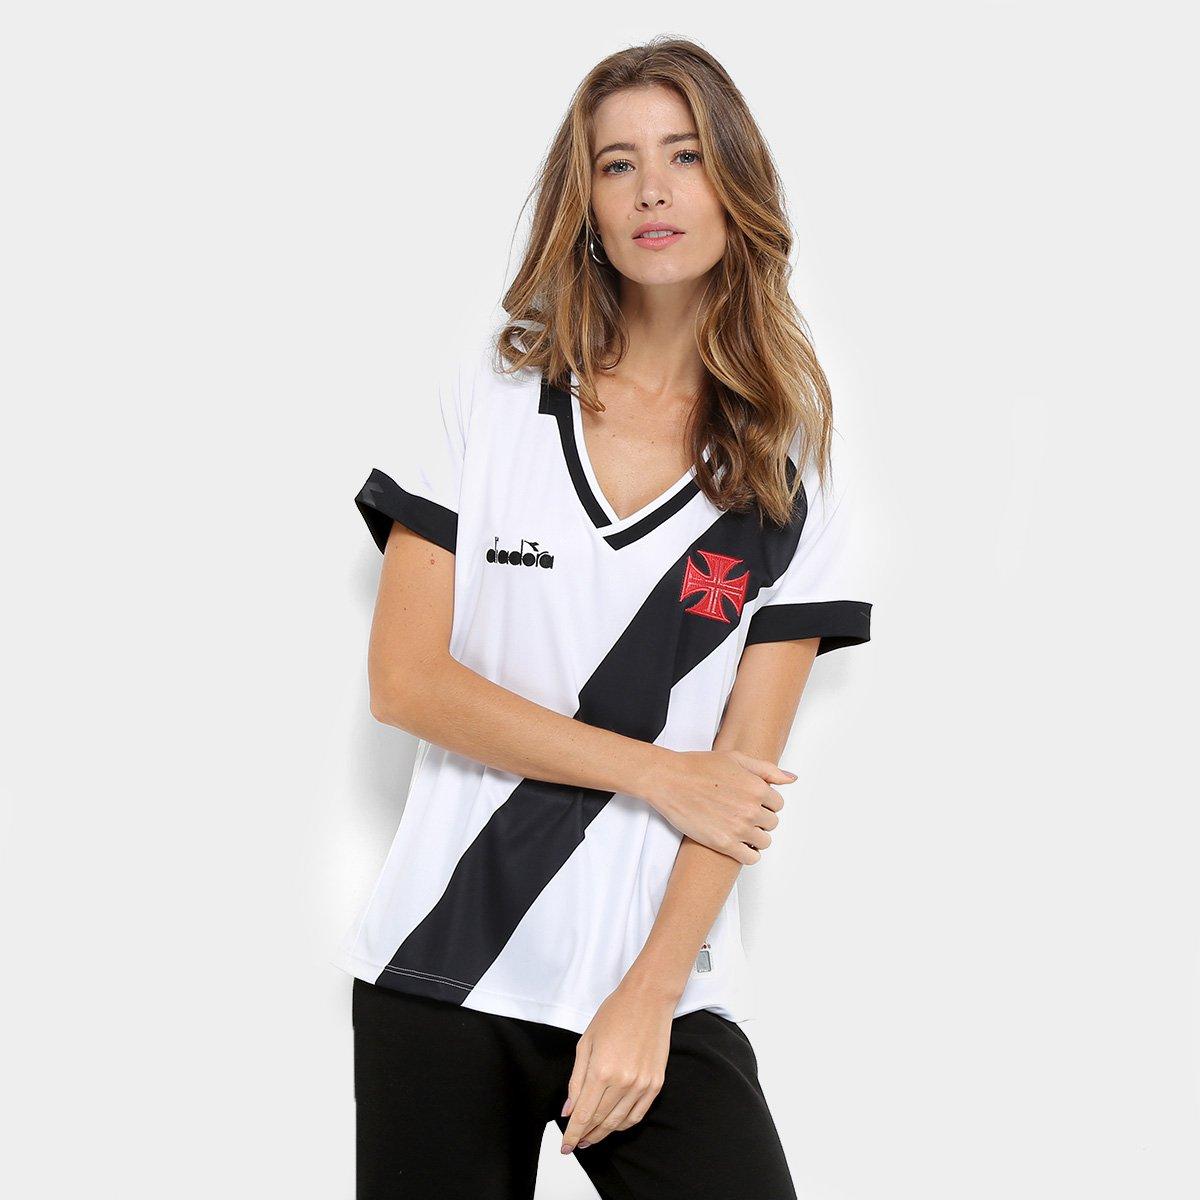 Camisa Vasco II 19 20 s n° - Torcedor Diadora Feminina - Branco ... 23821c2e9bcaa